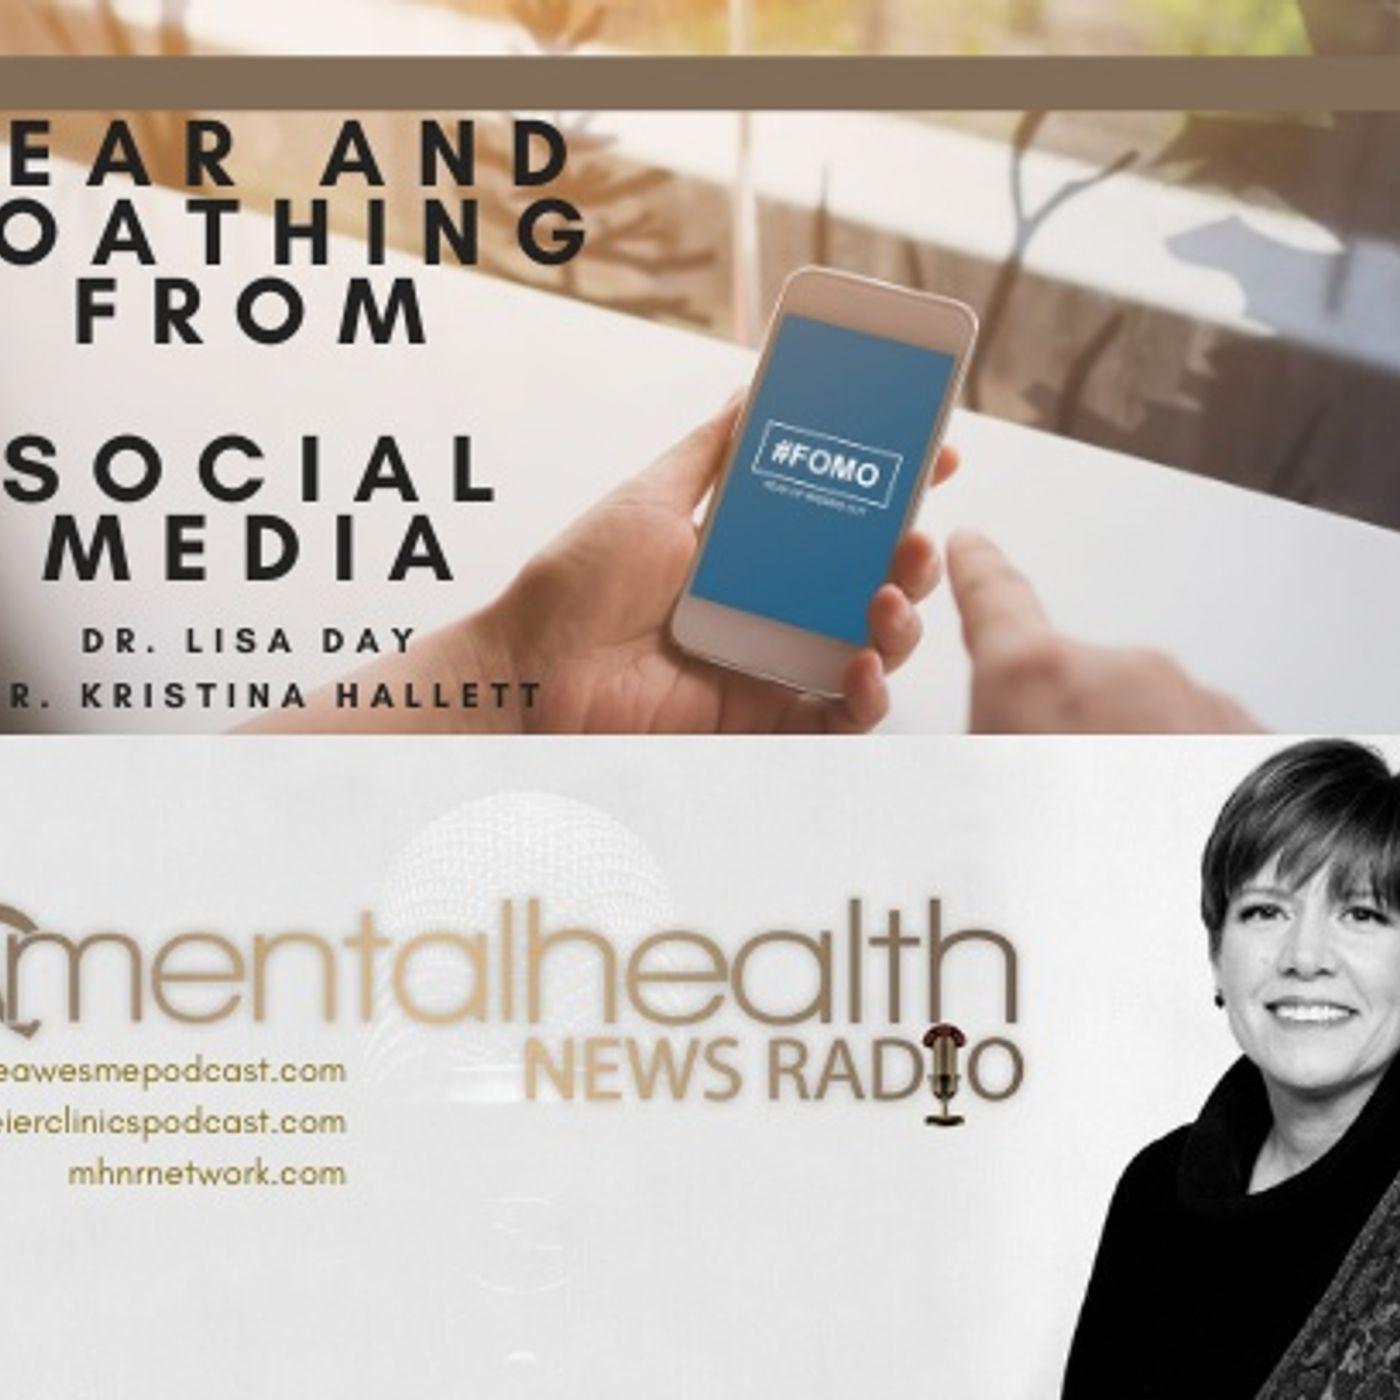 Mental Health News Radio - FOMO: Fear and Loathing from Social Media